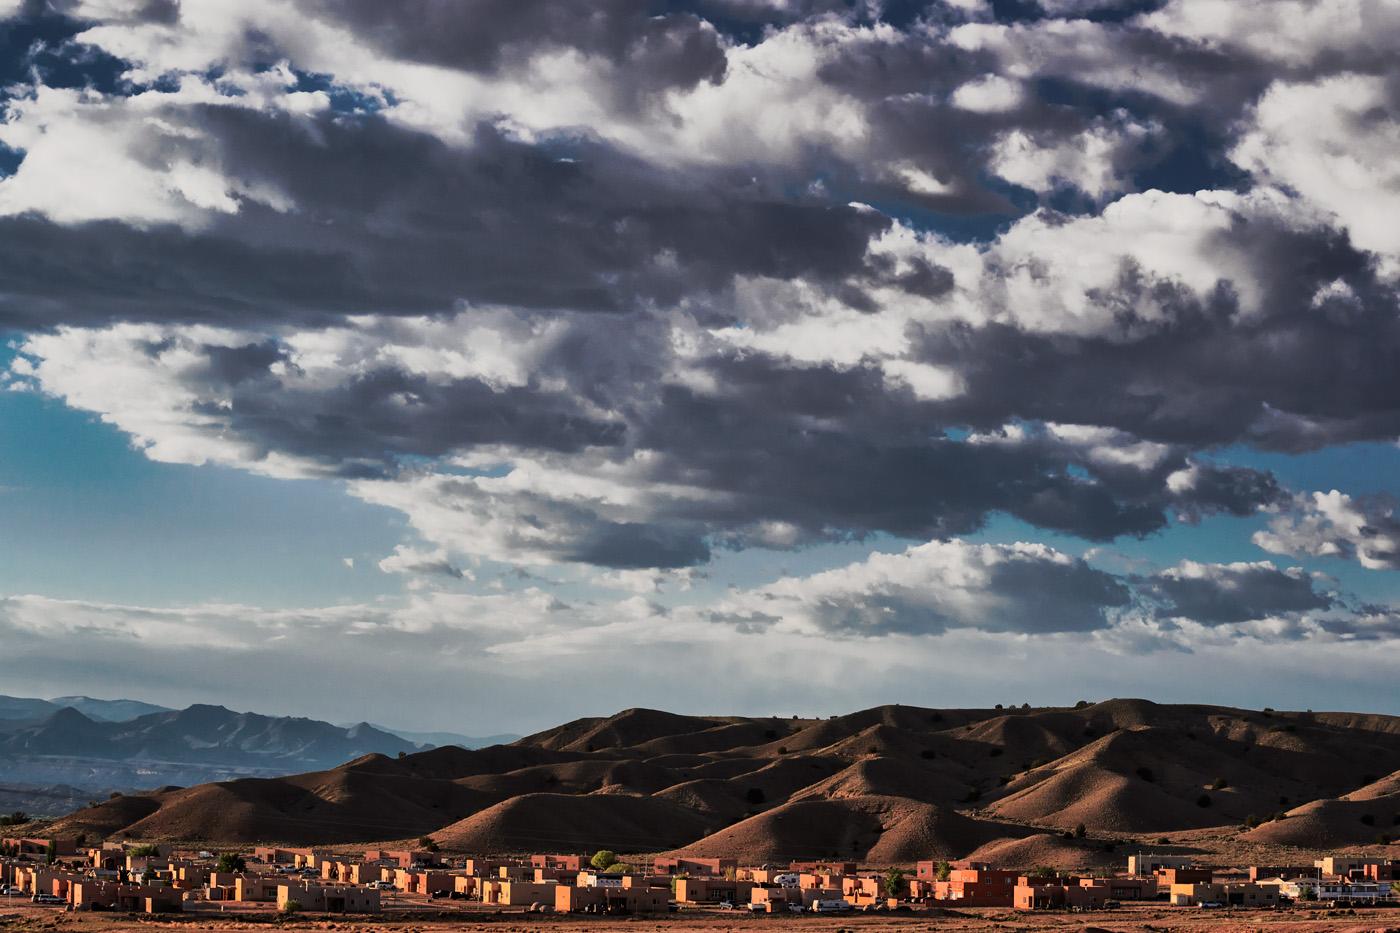 Hamlet in New Mexico | 2014